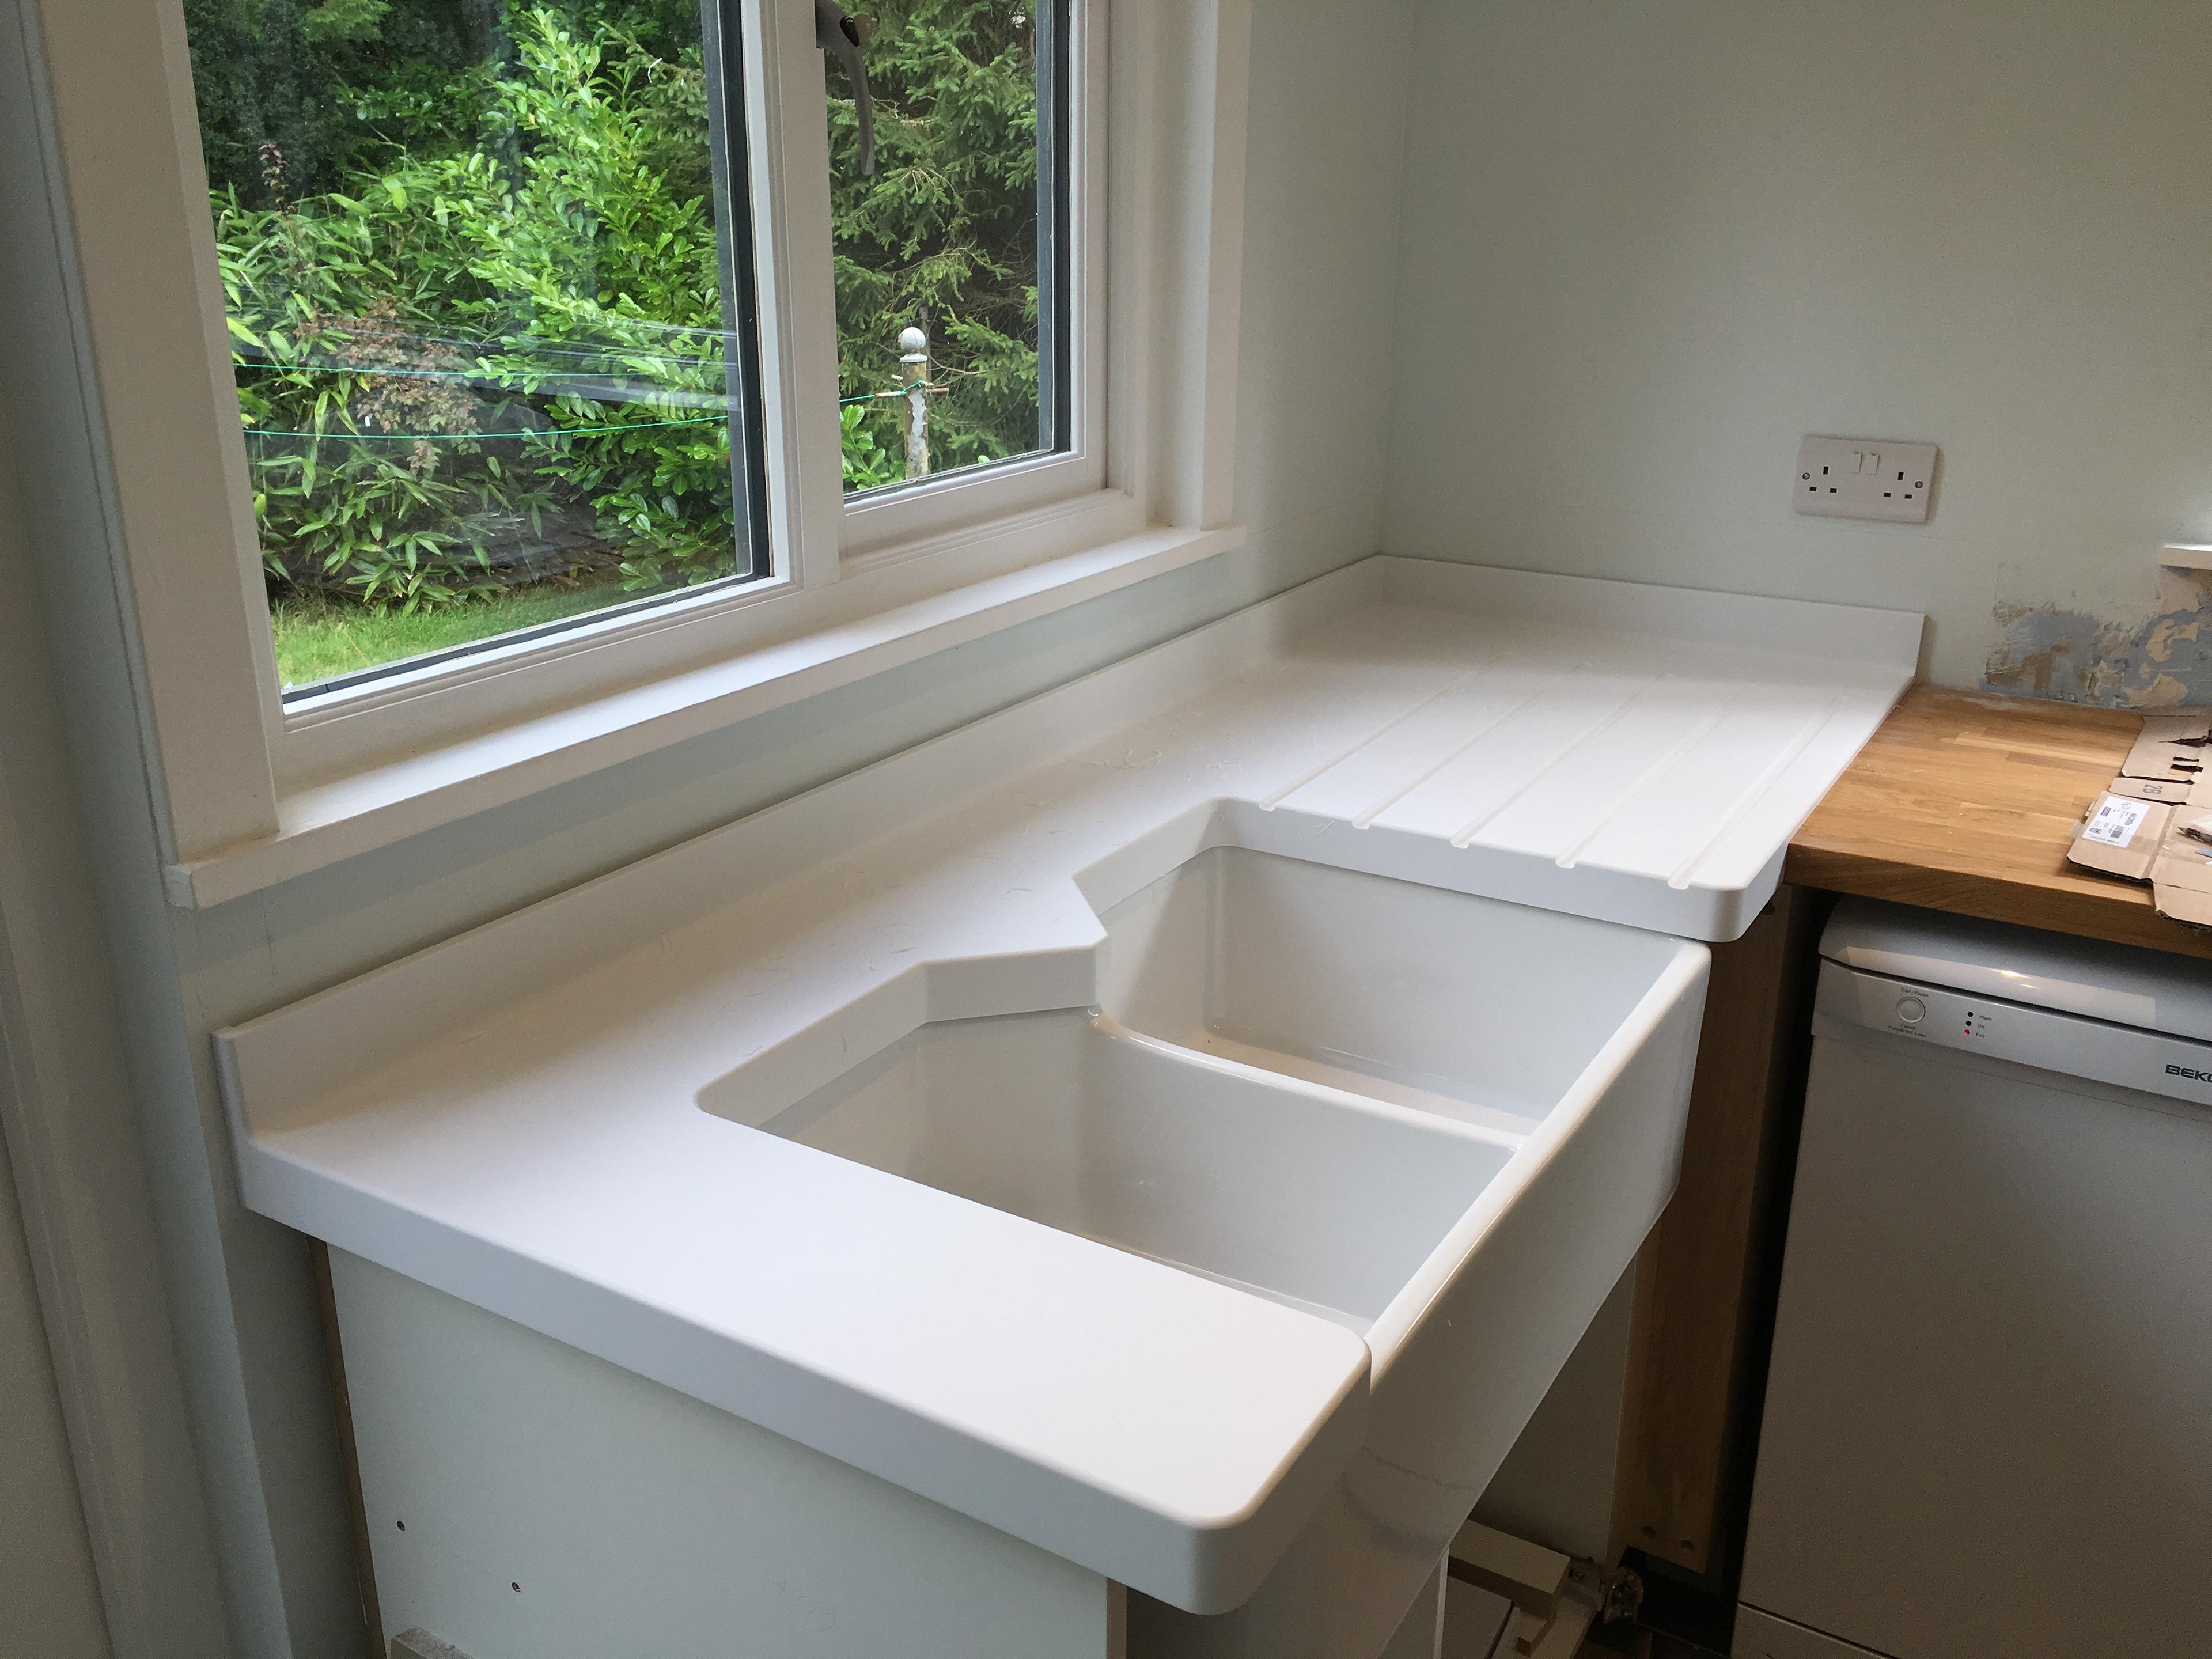 Sorell Furniture - Corian Kitchen Sink Area